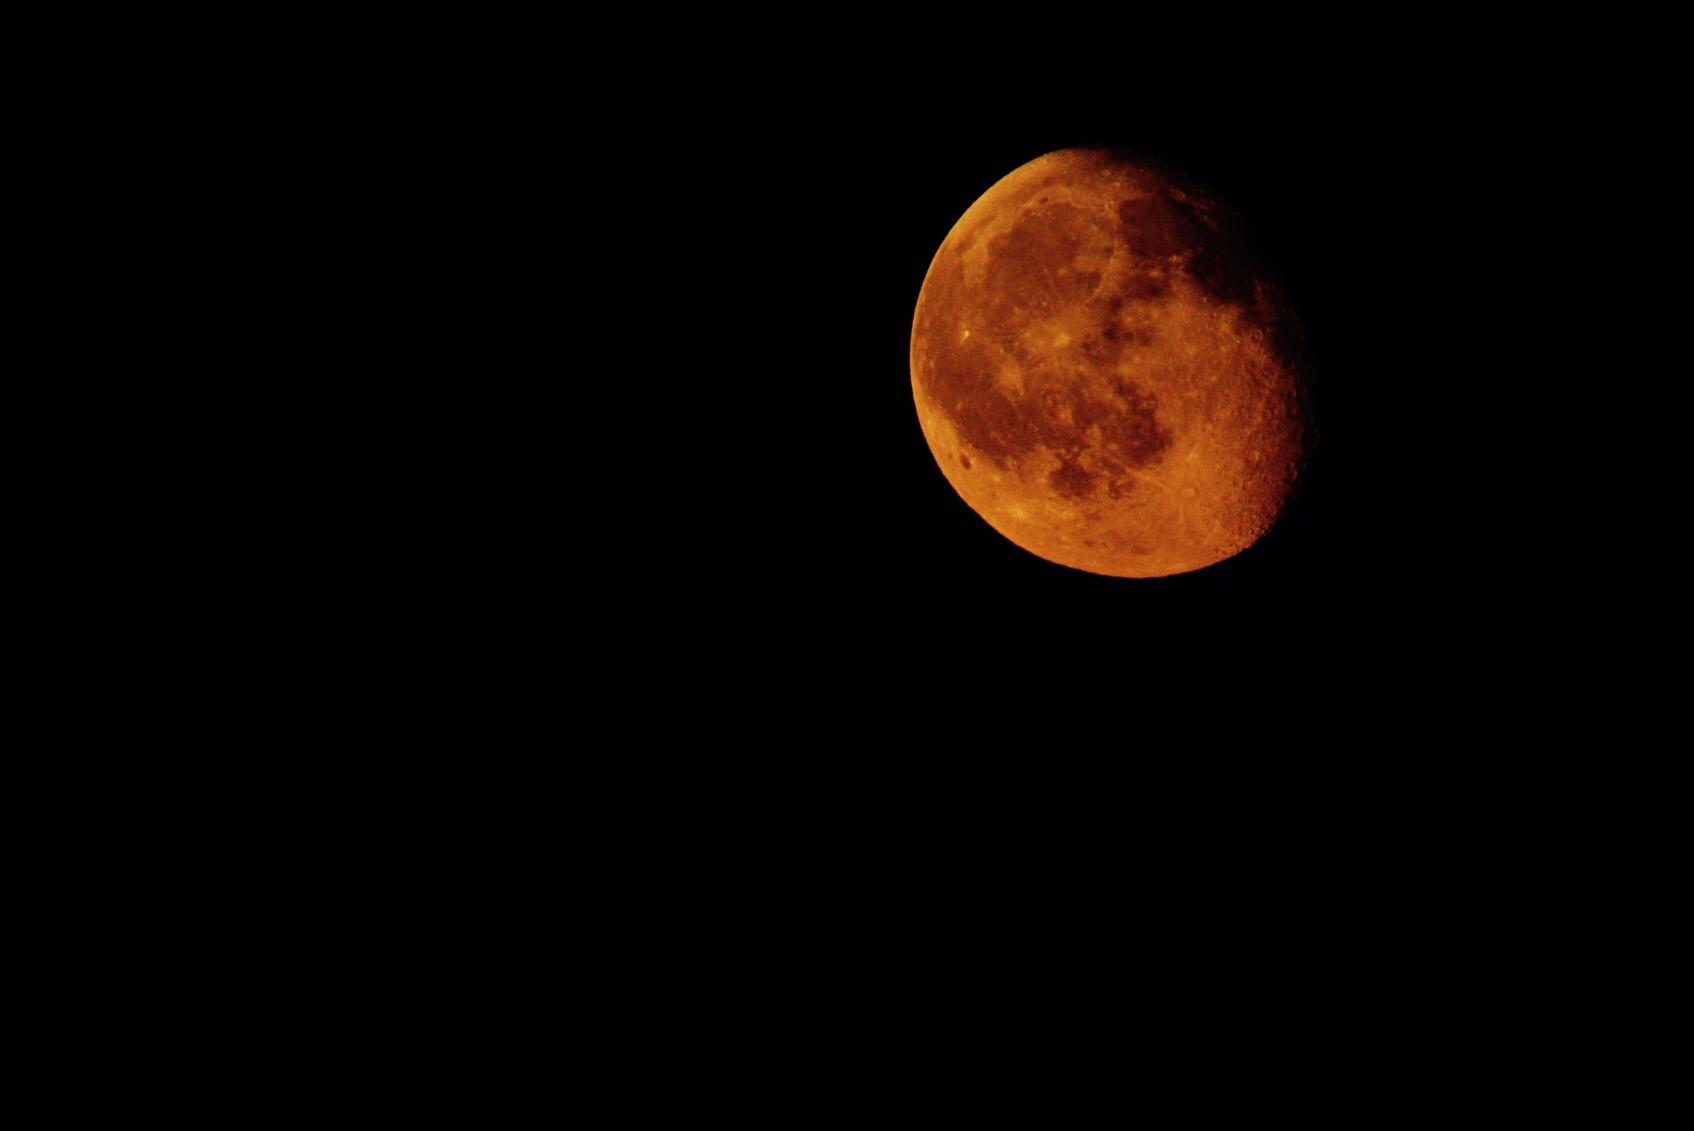 Red moon by Andrea Battistoni